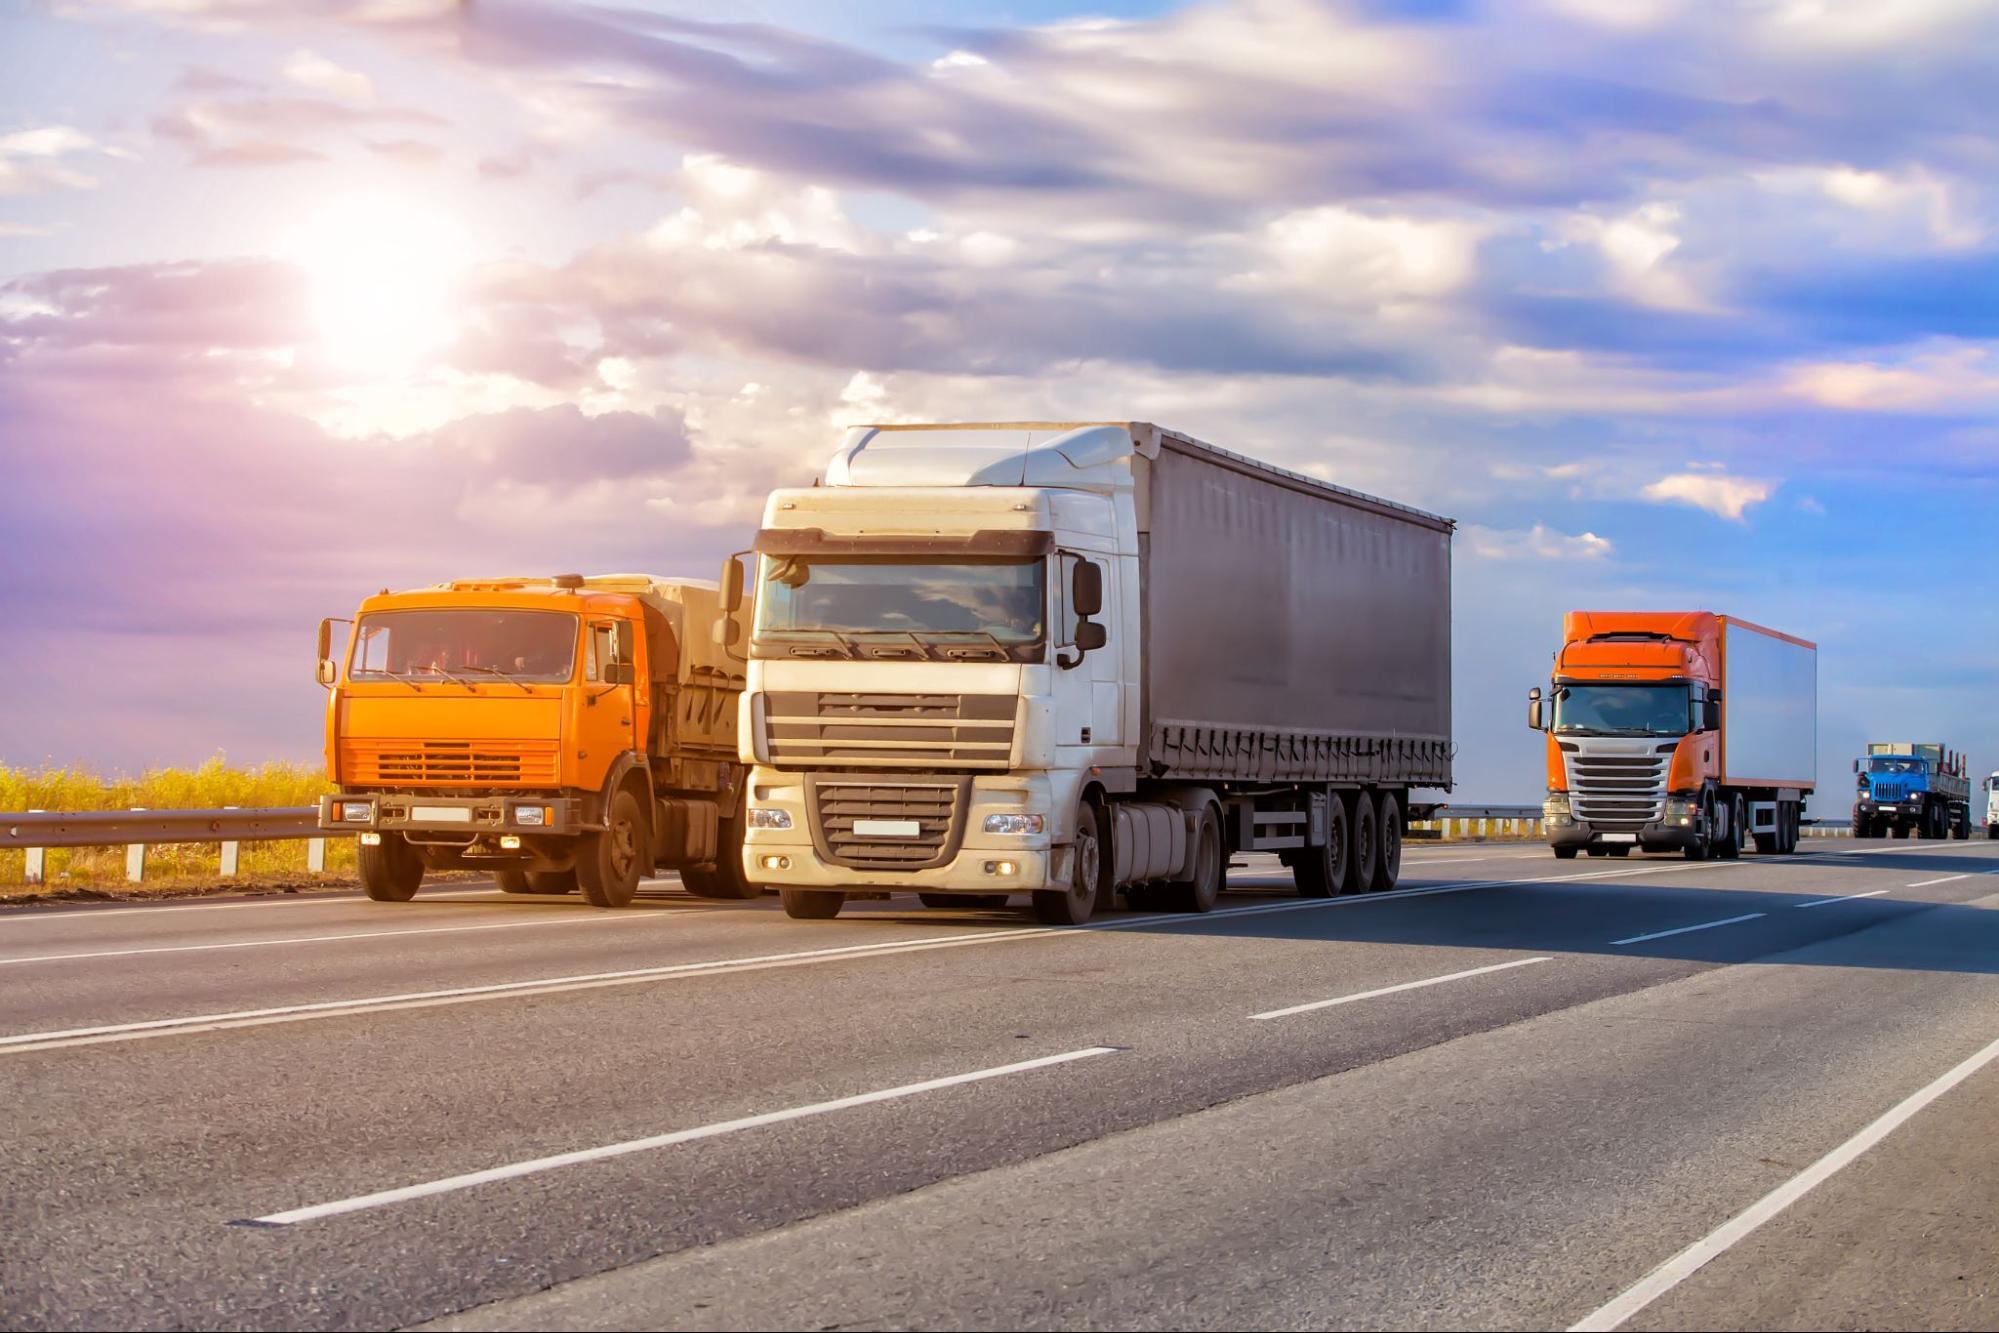 Fleet of commercial trucks on the highway